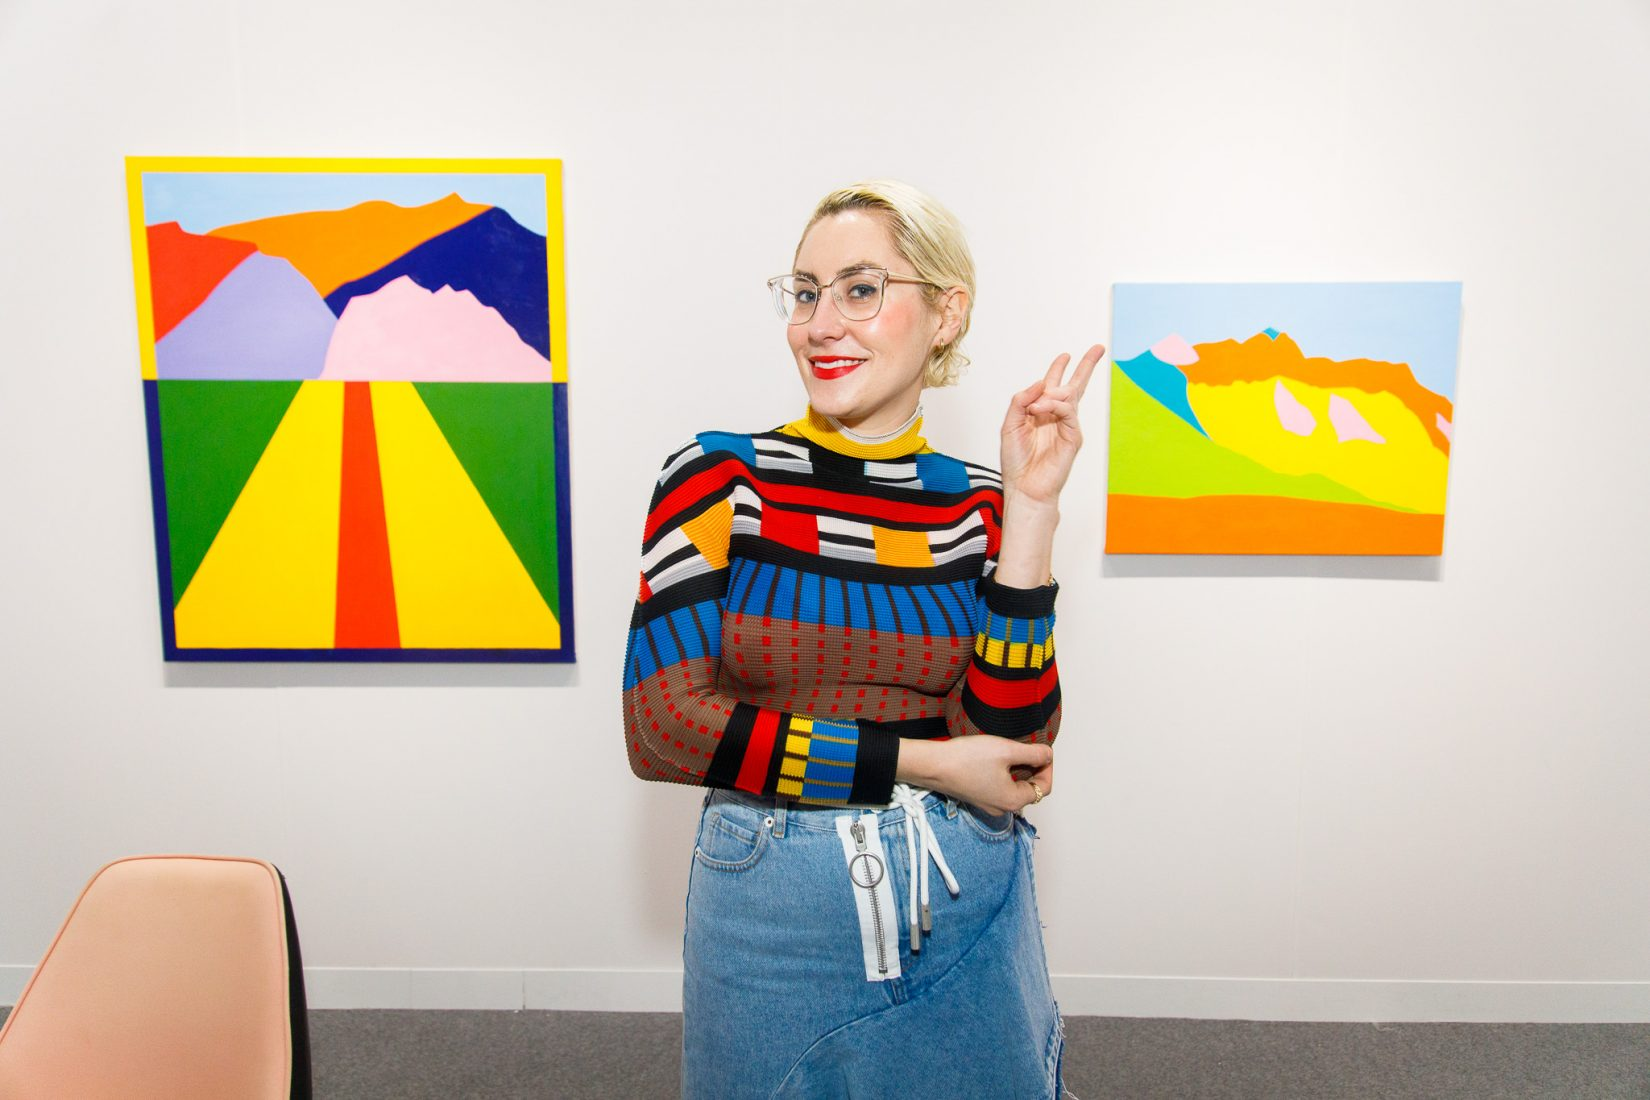 VOLTA NY Brings A World of Art to Metropolitan West